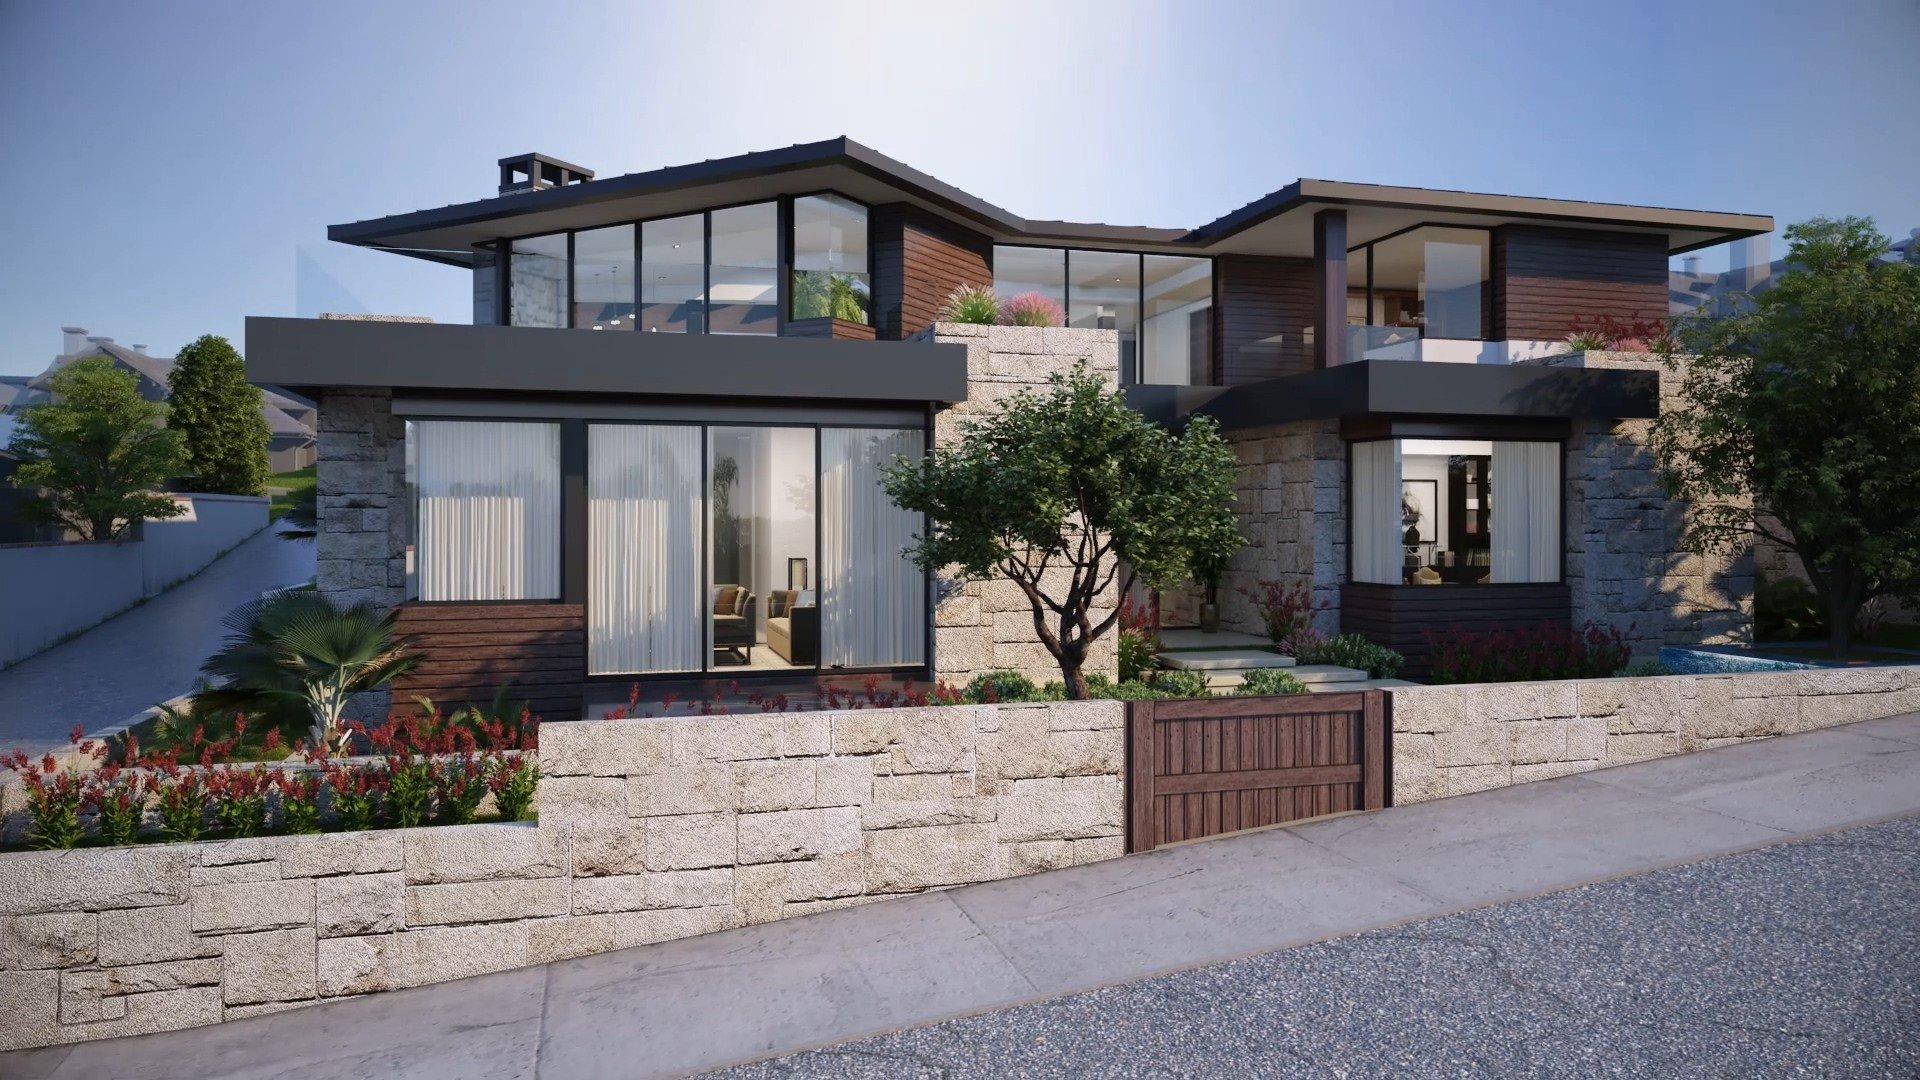 Architectural Visualization: 3D Walkthrough for Tedeschi Residence's Pre-construction Marketing